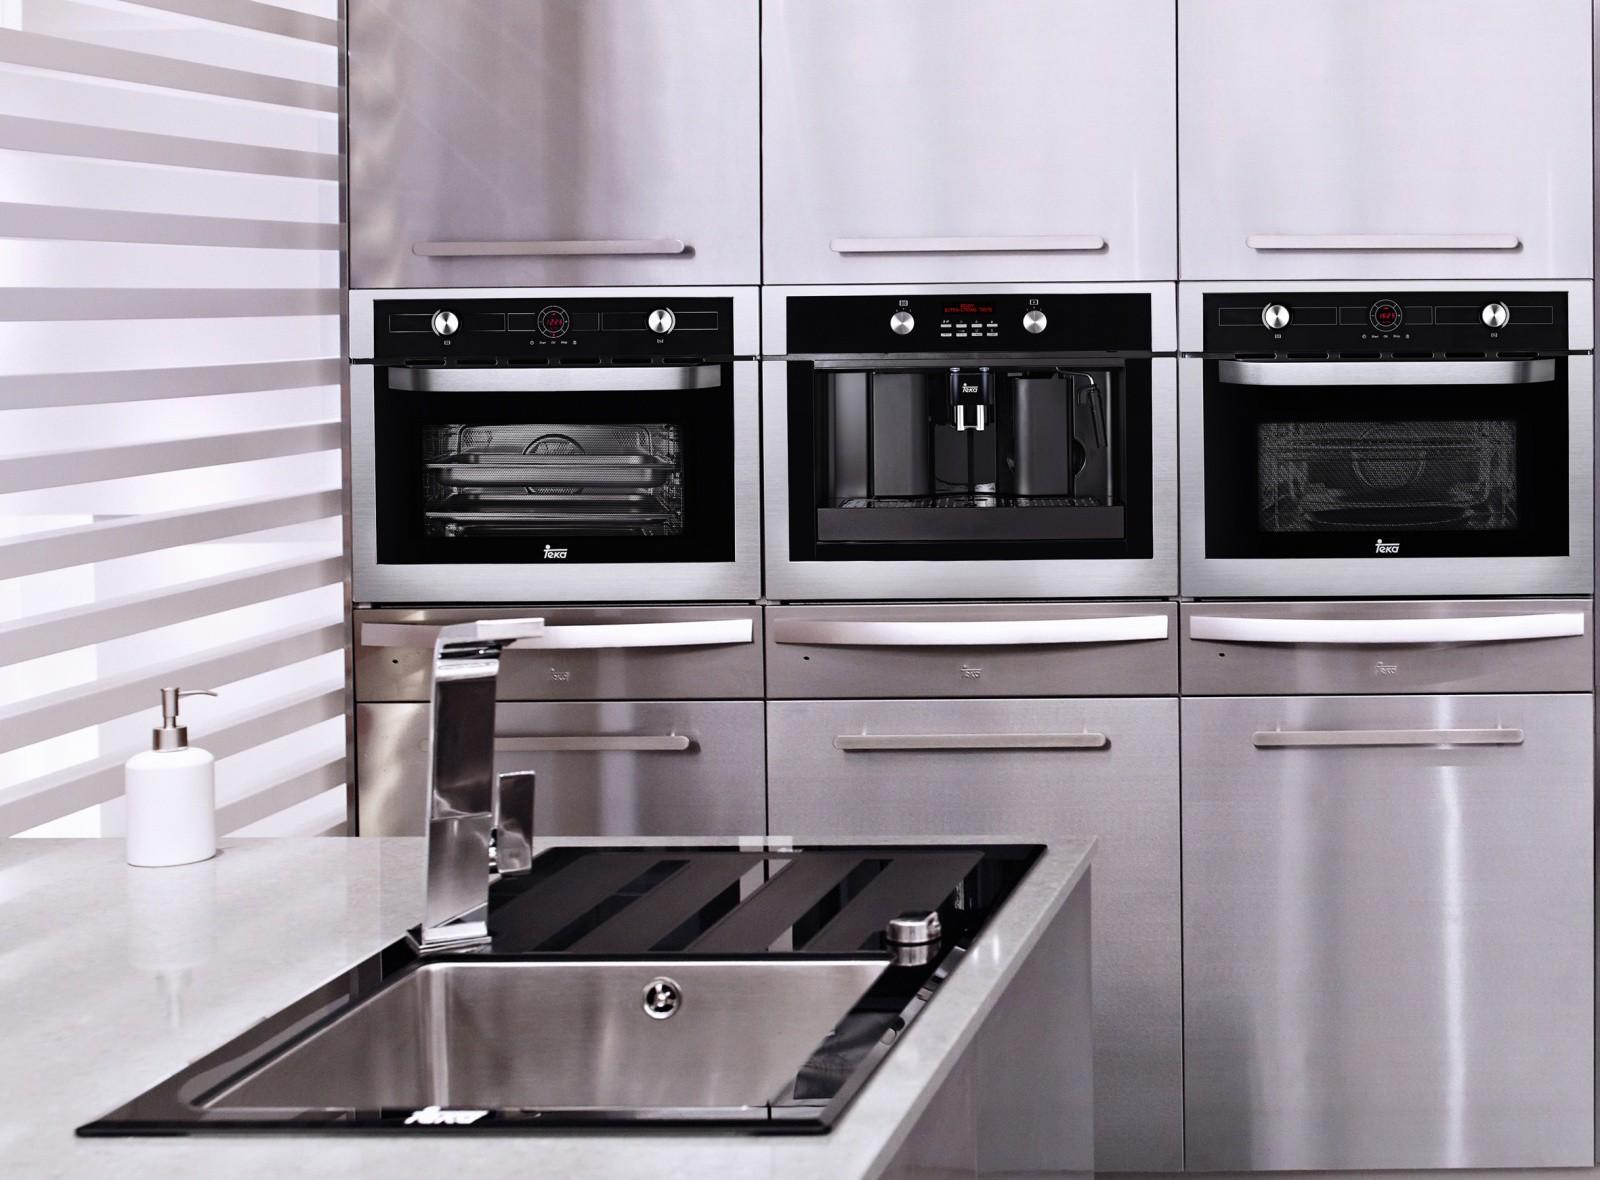 Uncategorized. Teka Kitchen Appliances. jamesmcavoybr Home Design